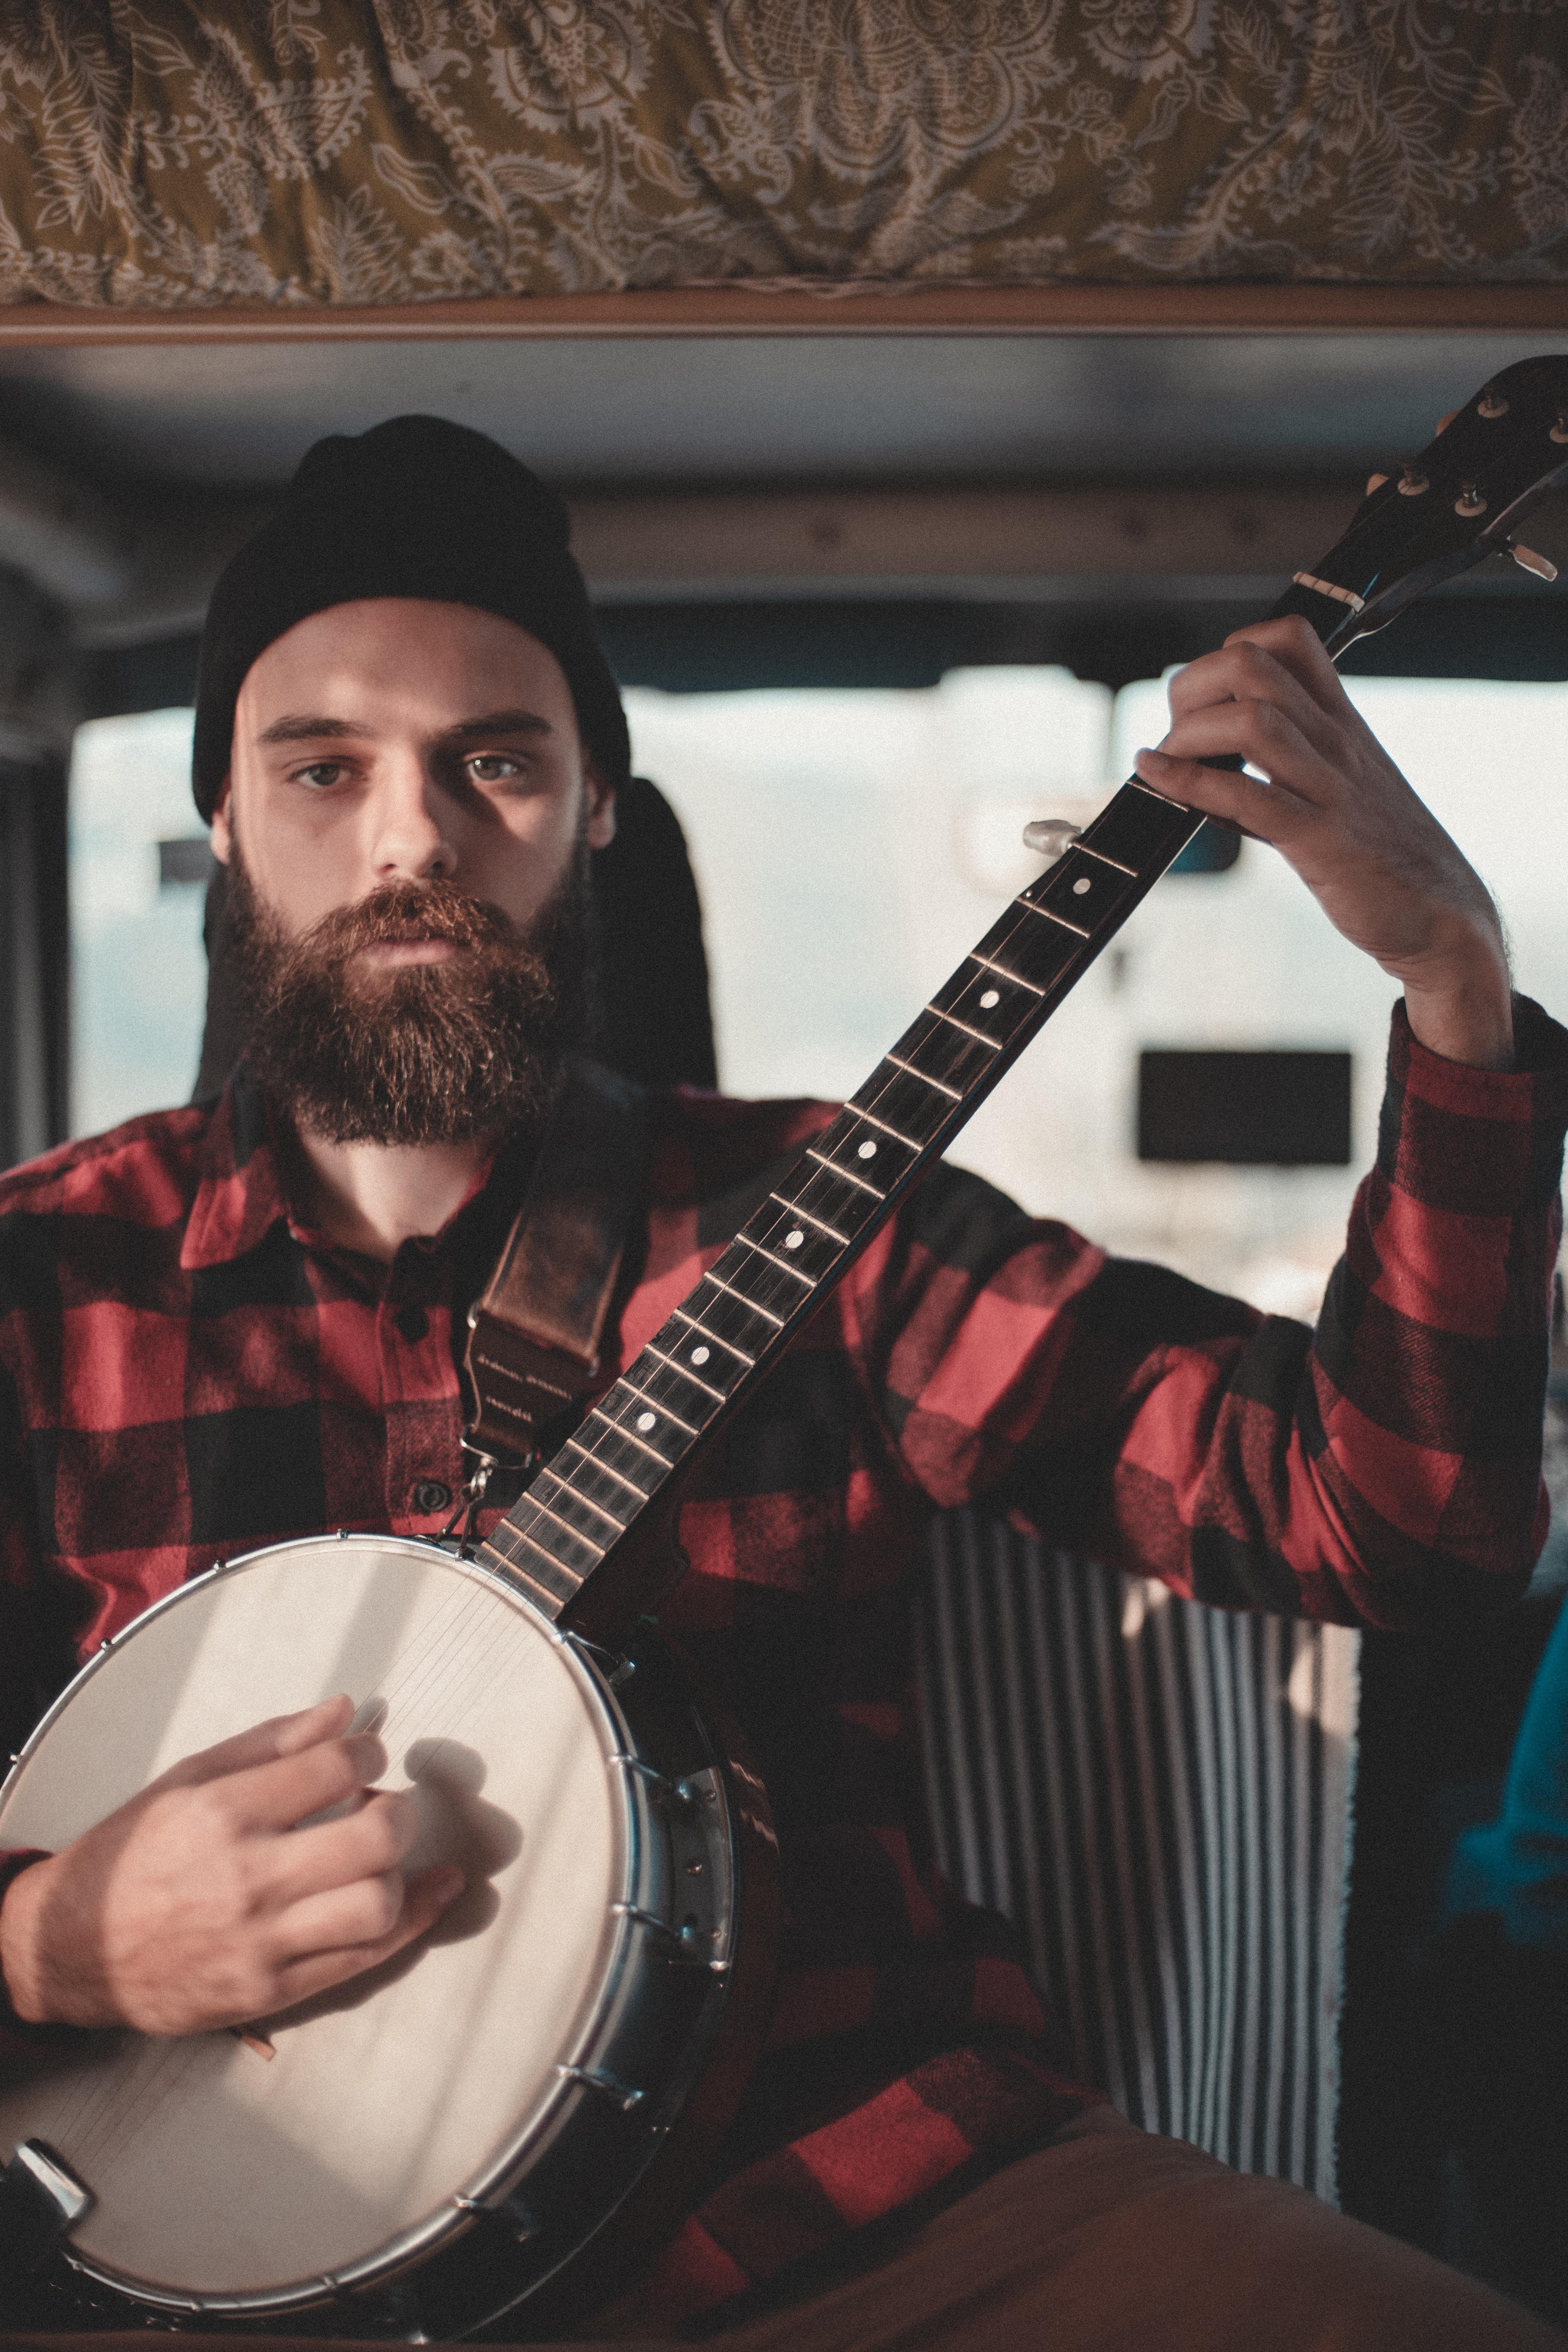 man holding string instrument